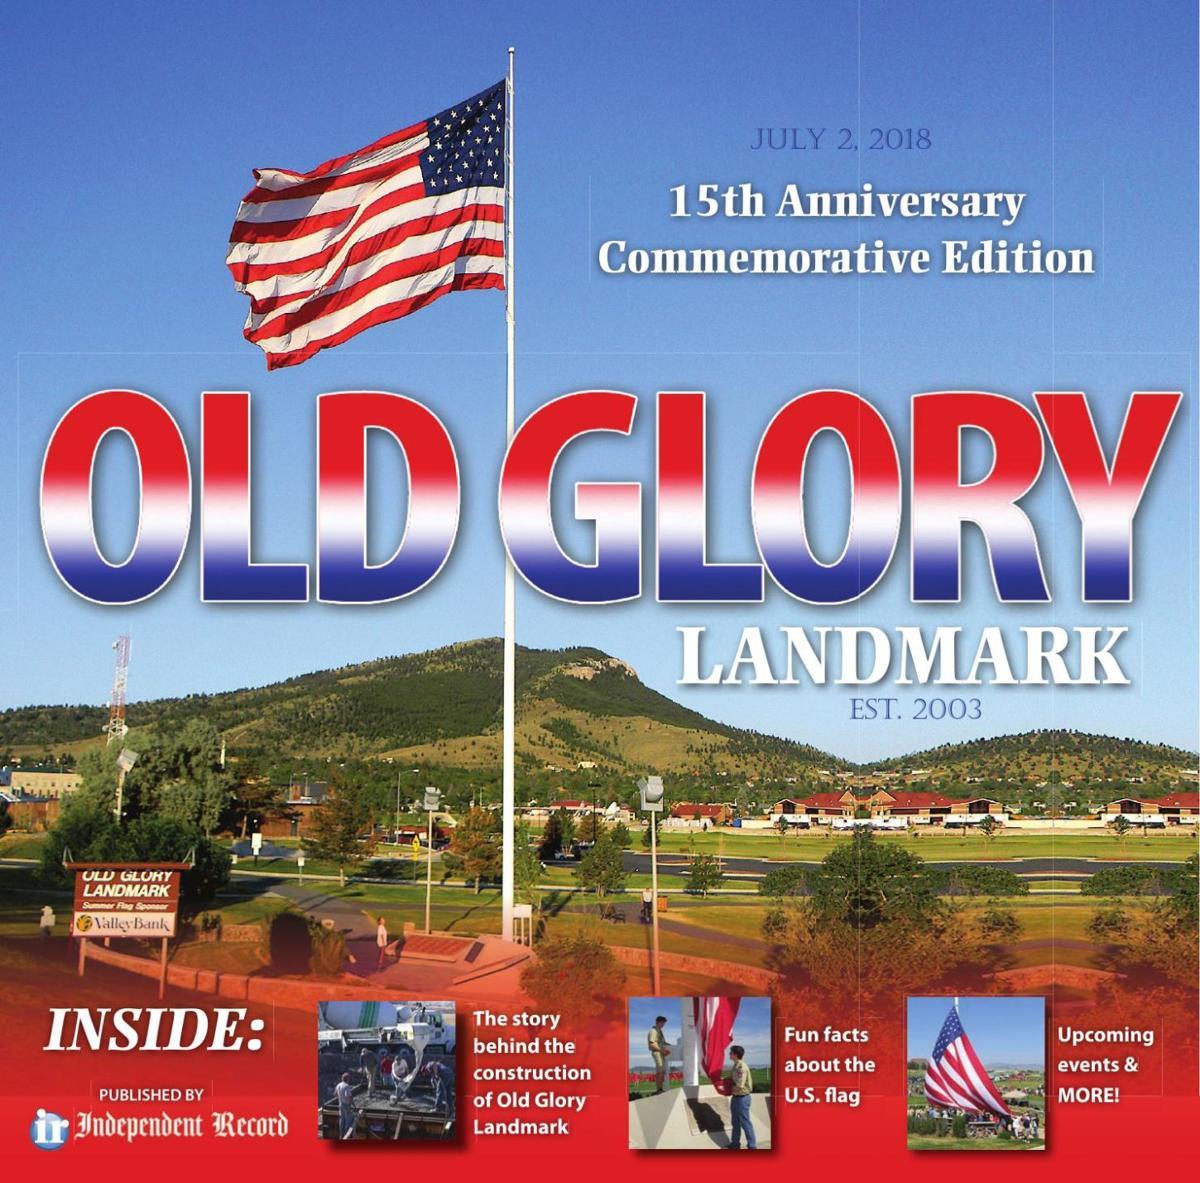 Old Glory Landmark 15th Anniversary Commemorative Edition - July 2, 2018